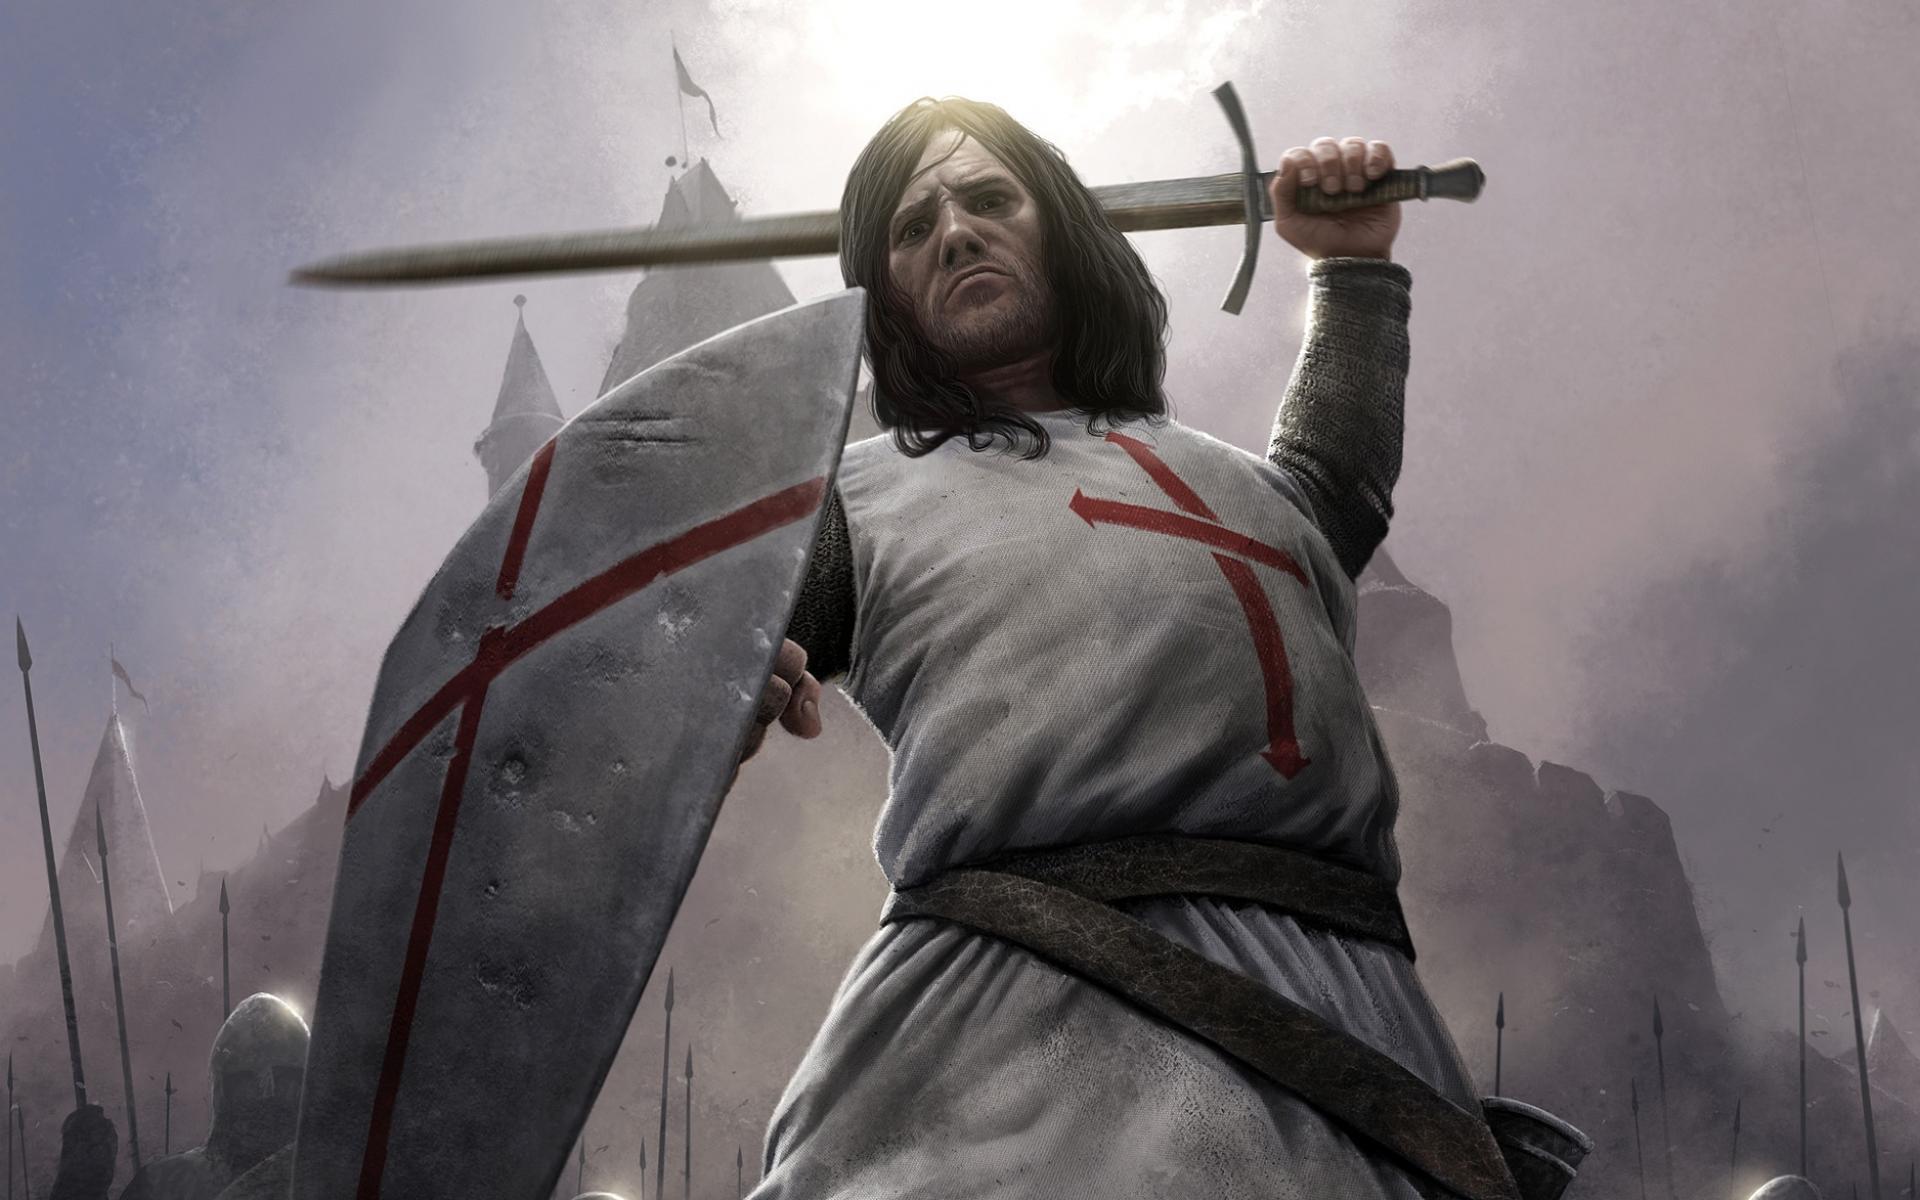 knight, рыцарь крестоносец в бою, доспехи, меч, щит